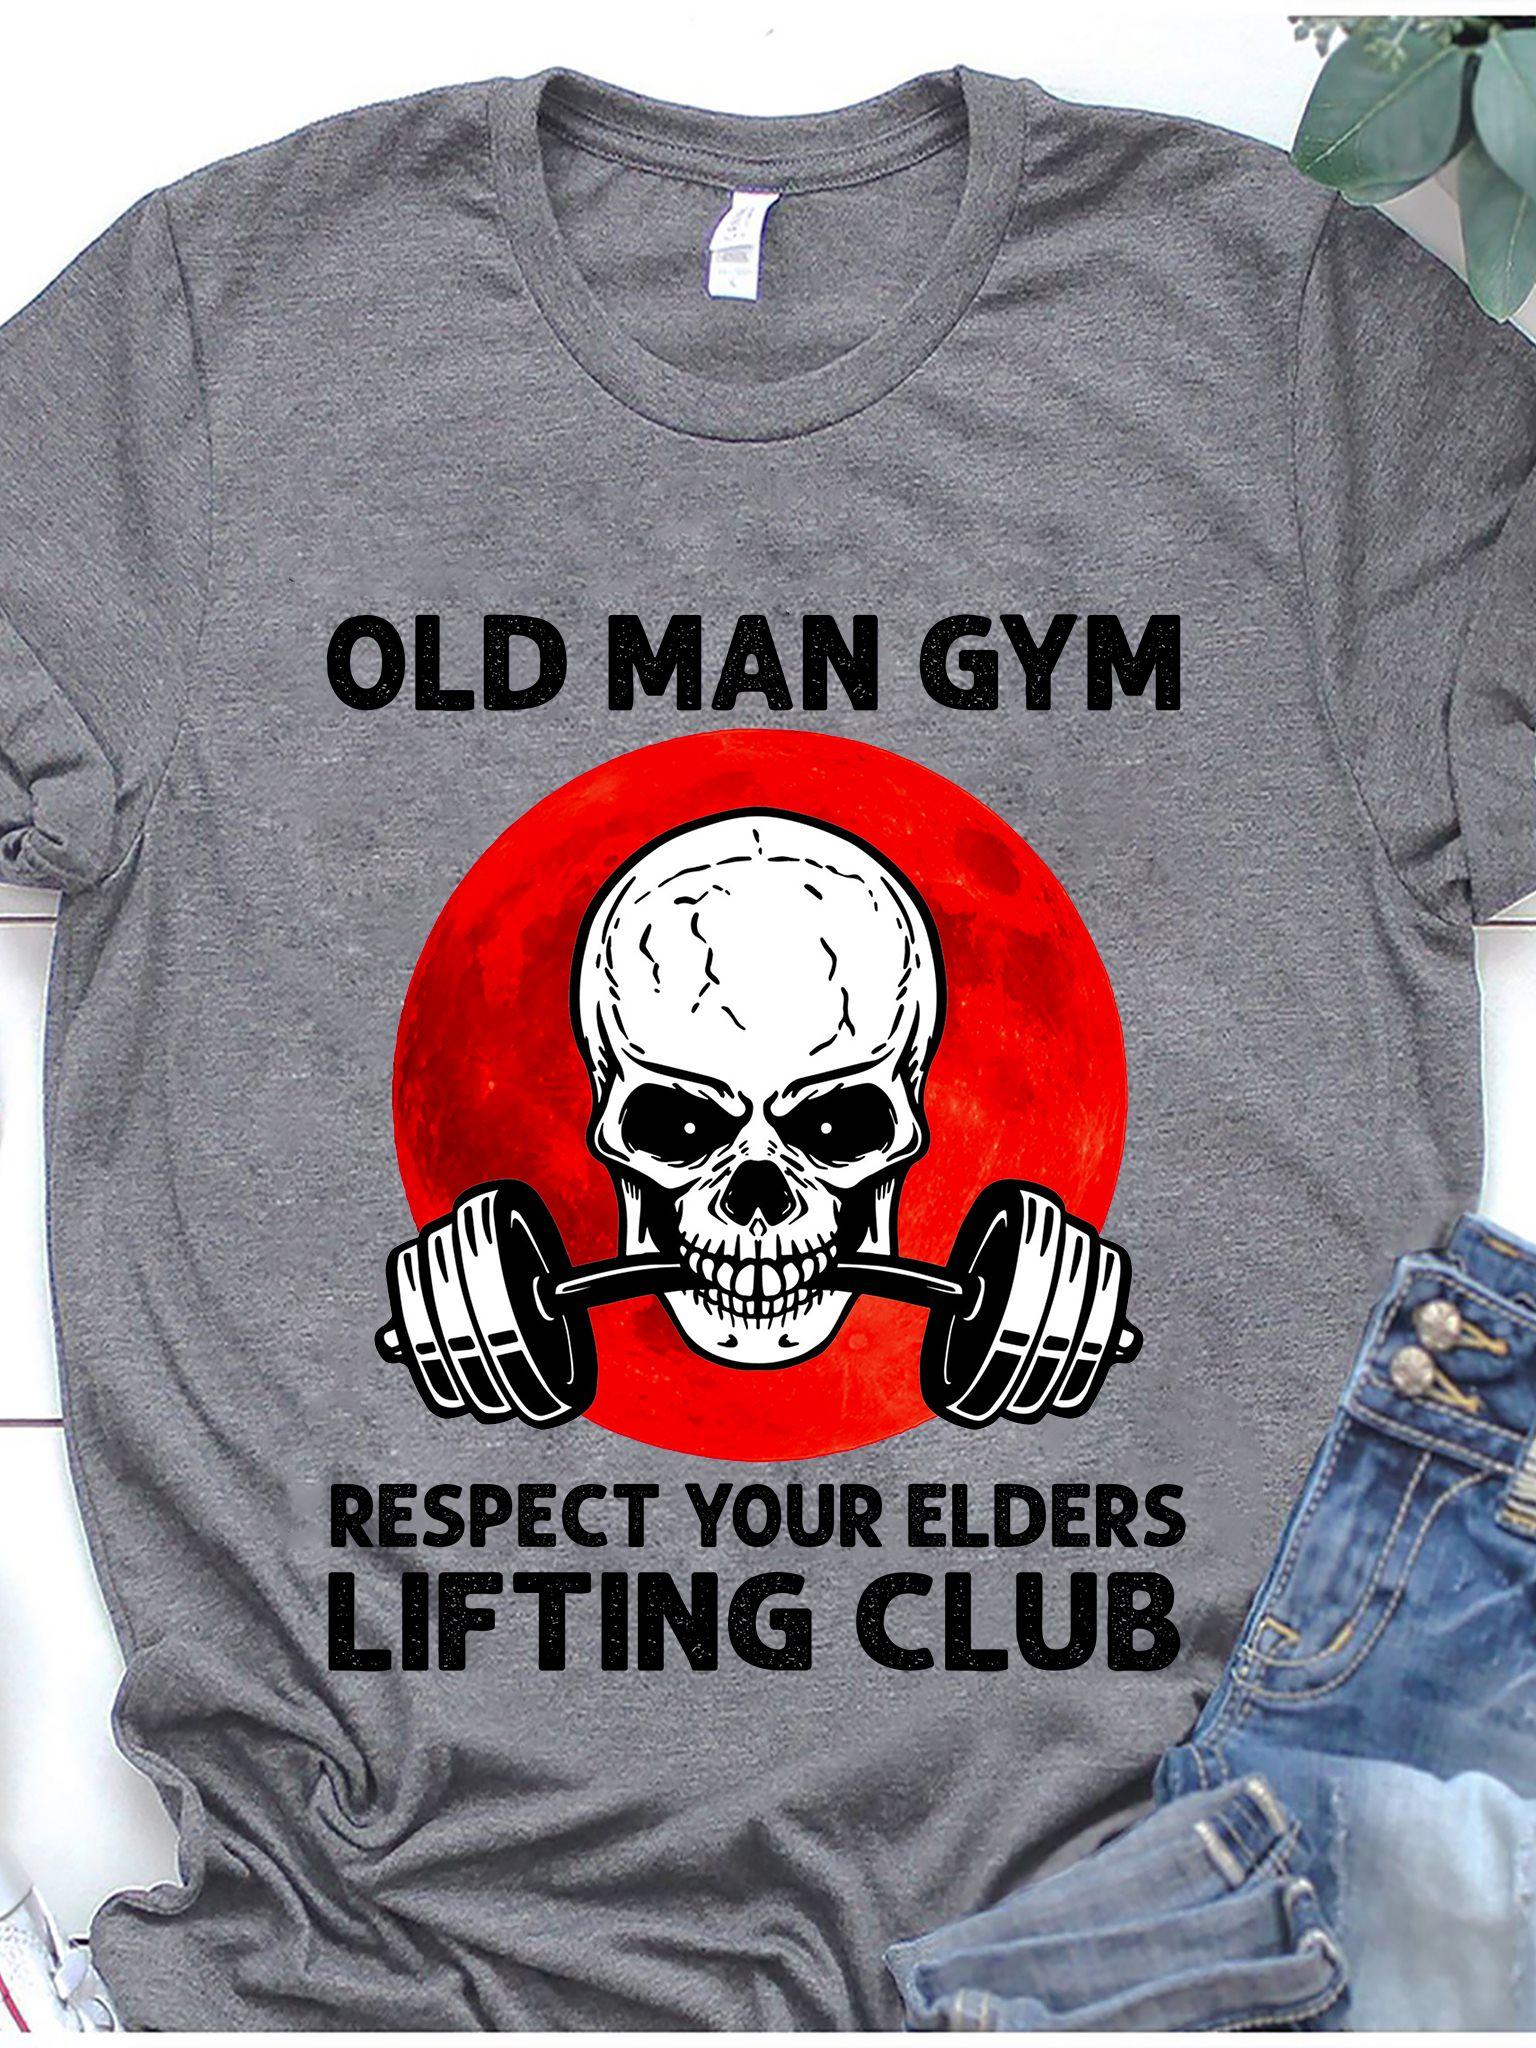 Old Man Gym Shirt Skull Lifting Club Respect Your Elders